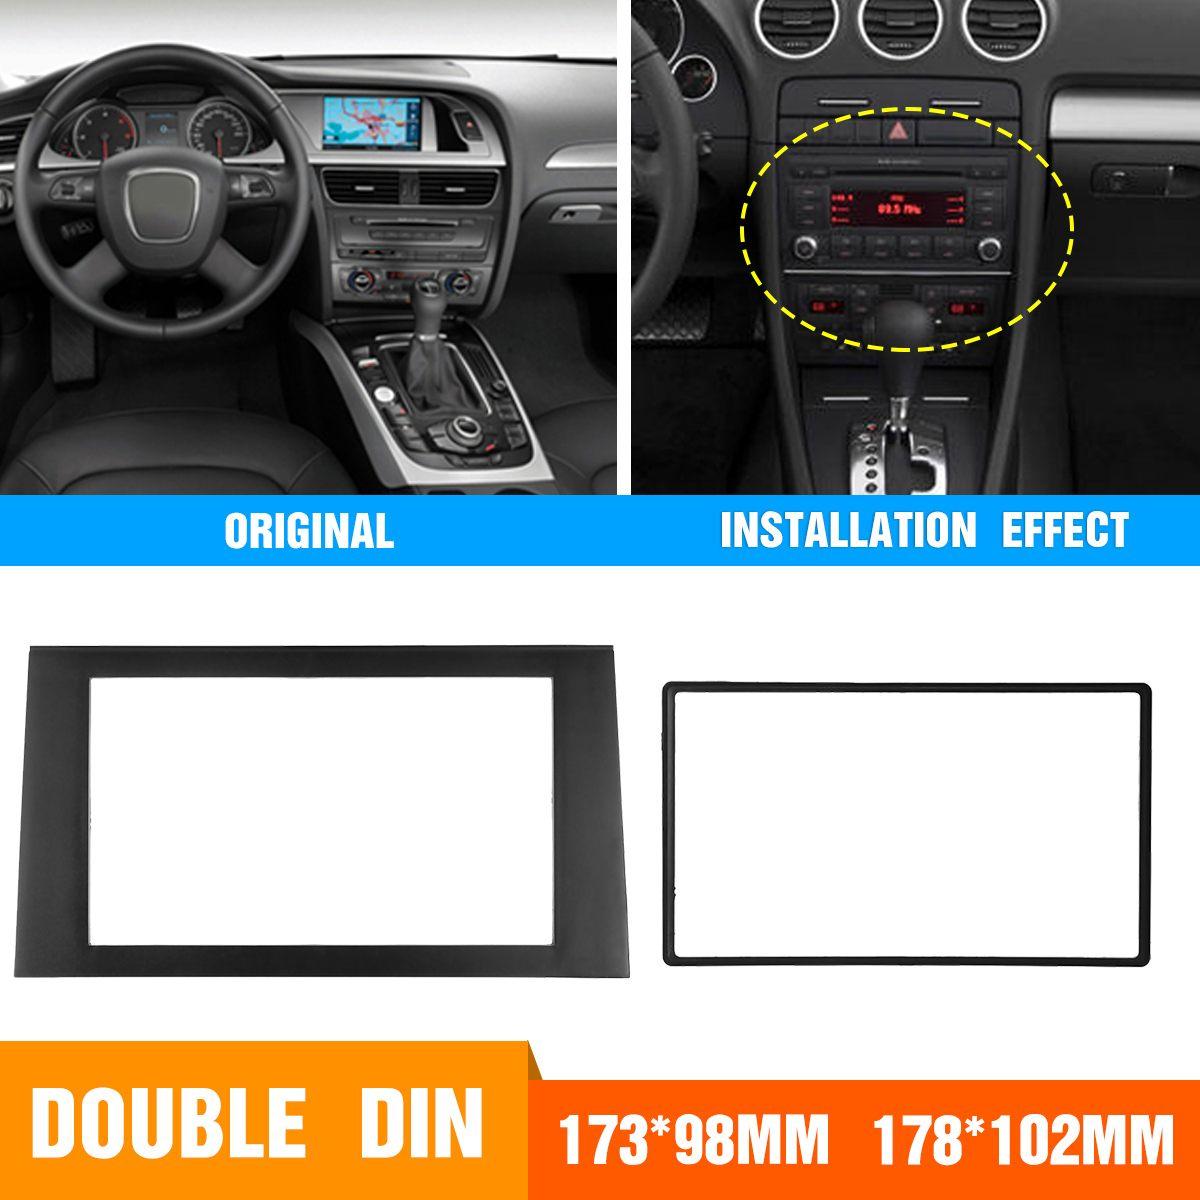 2DIN Car Stereo Radio Fascia Panel Plate Frame Adaptor CD Trim Dash Mount Kit For Audi A4 B7 2002-2008 /2002-2006 A4 B6/SEA